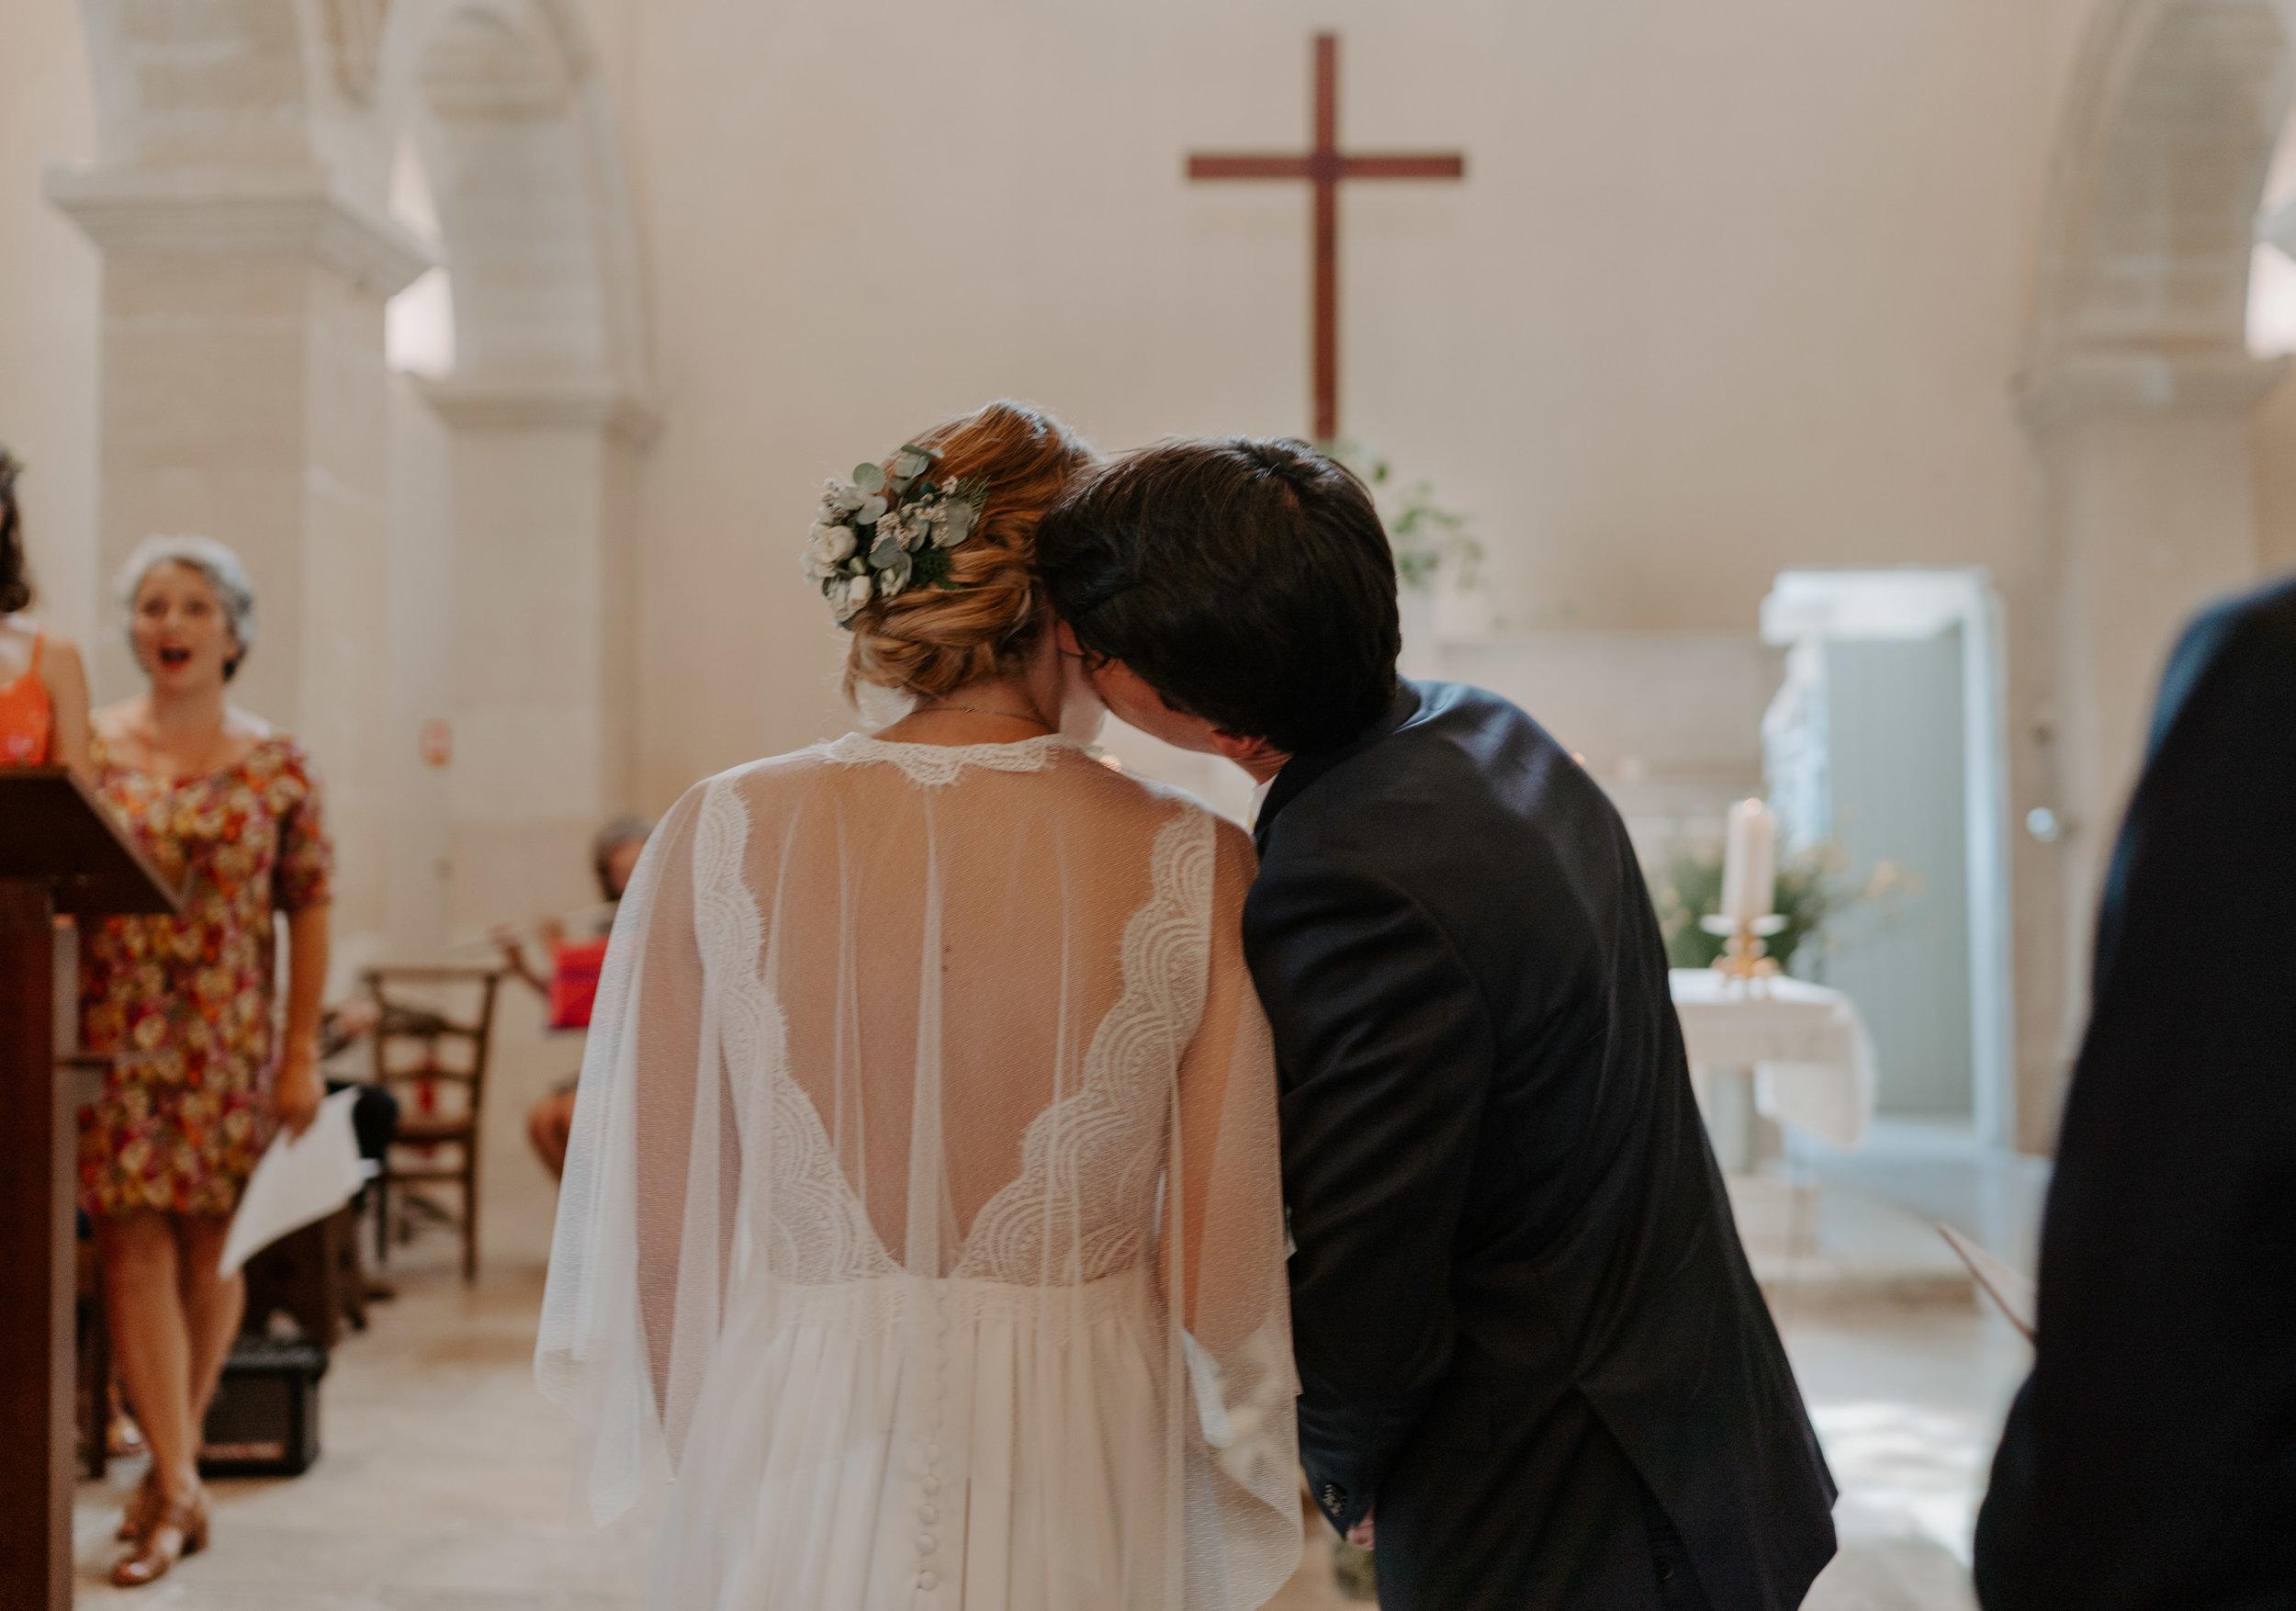 elsacaza_photographe_mariage_Juliette_Nicolas-224.jpg